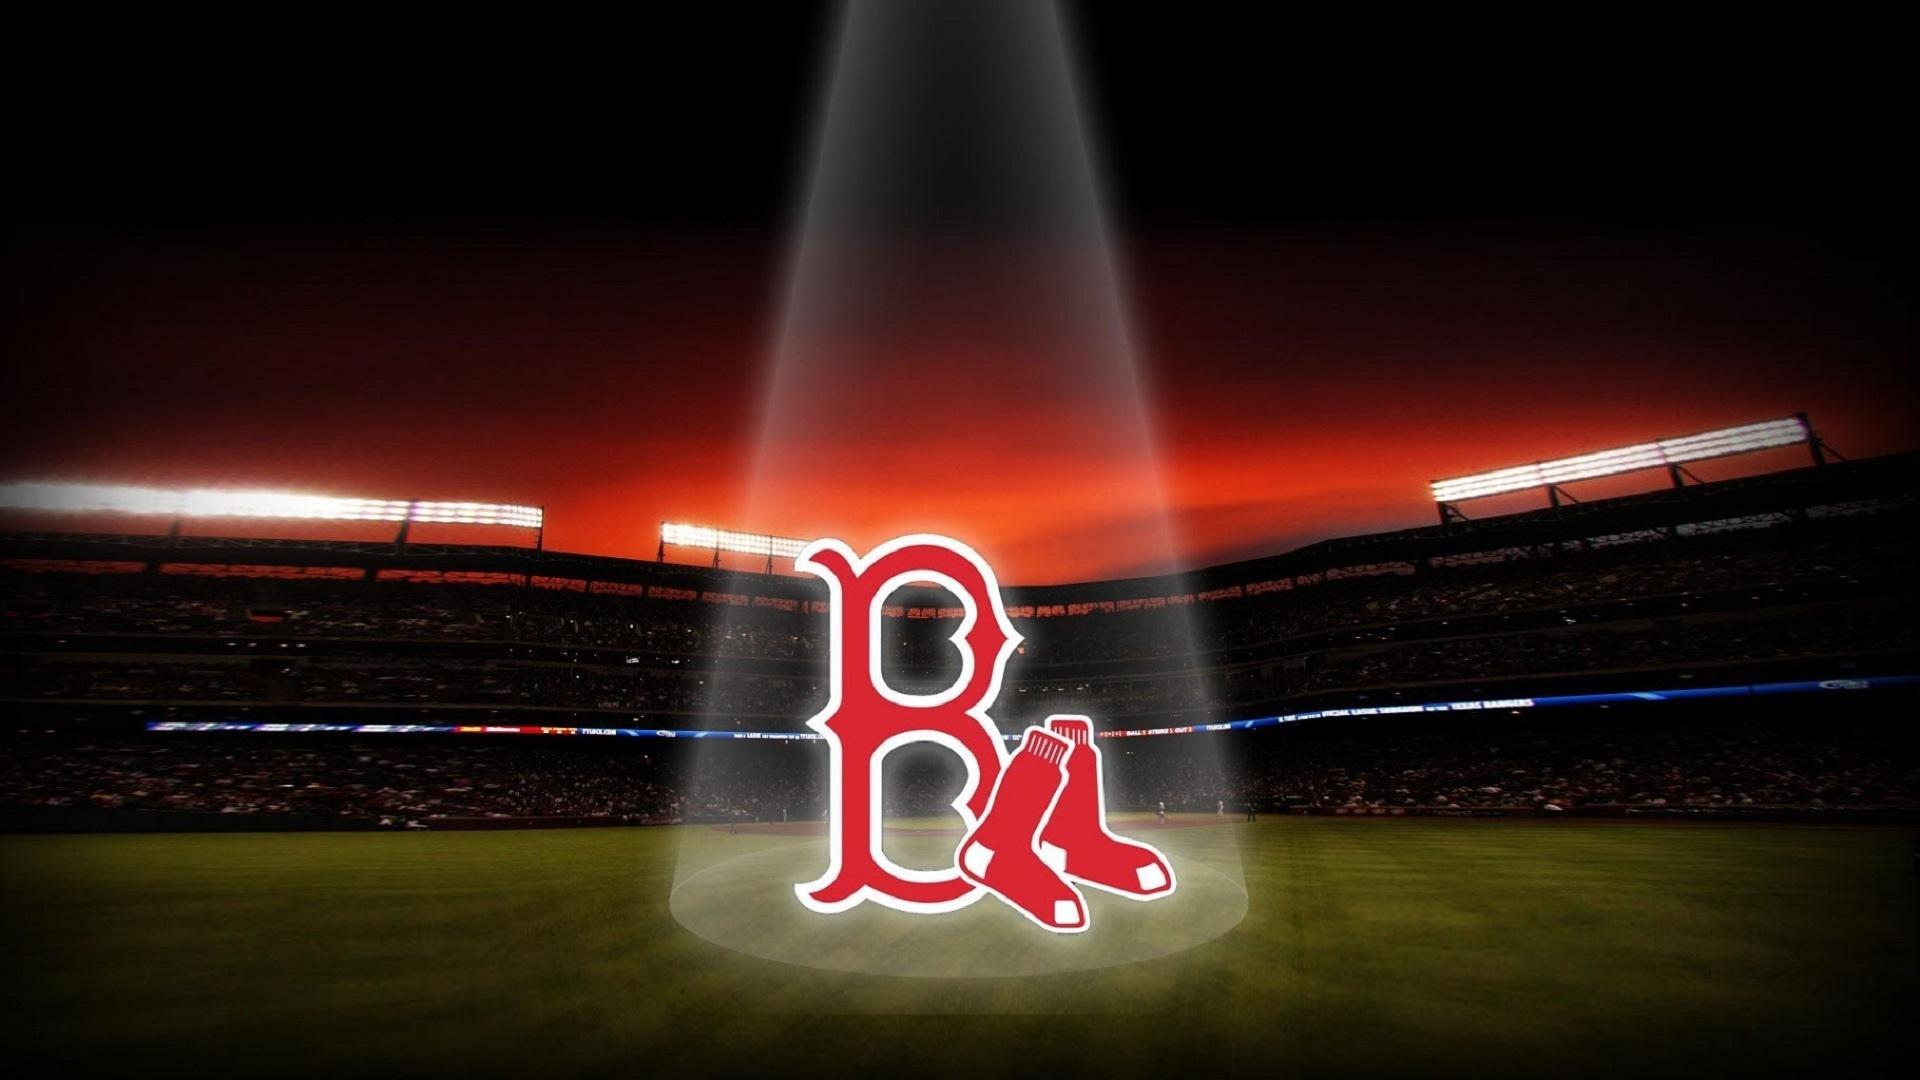 Boston Red Sox Logo Desktop Backgrounds Page 2 of 3 wallpaperwiki 1920x1080